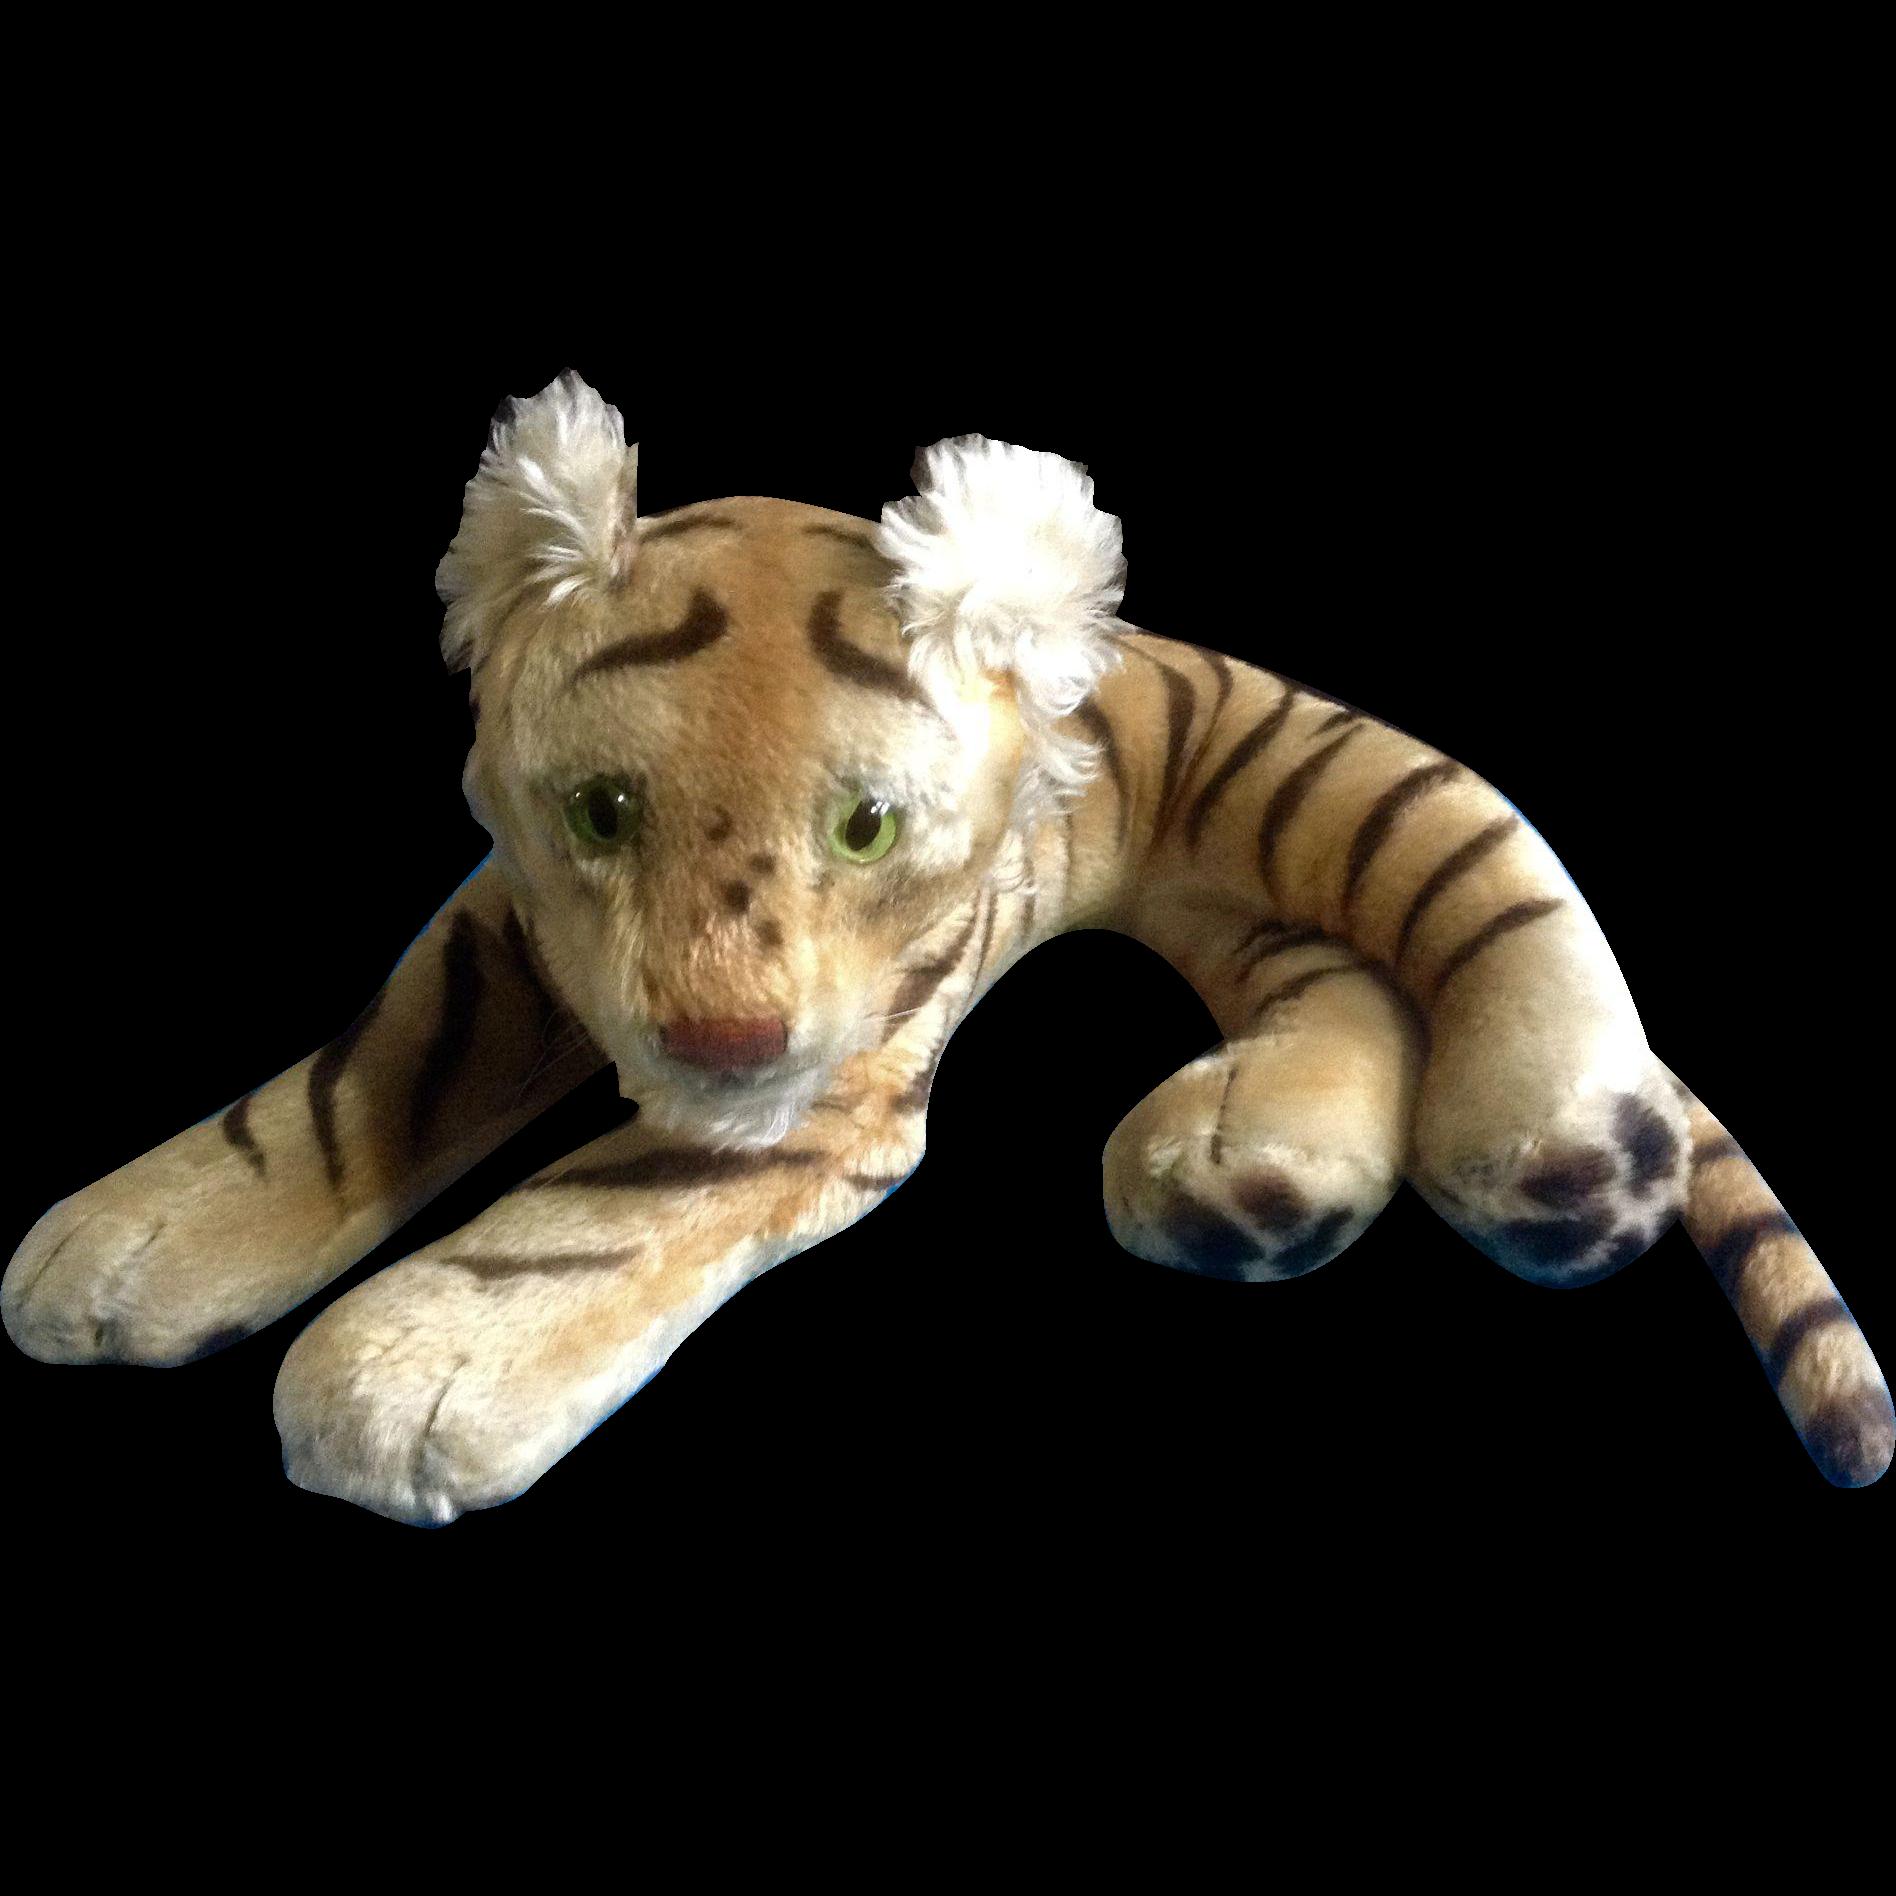 Vintage Steiff Bengal Tiger 1952 1953 Large Stuffed Plush Animal Green Glass Eyes Mohair Germany 23 Plush Animals Animals Steiff [ 1896 x 1896 Pixel ]